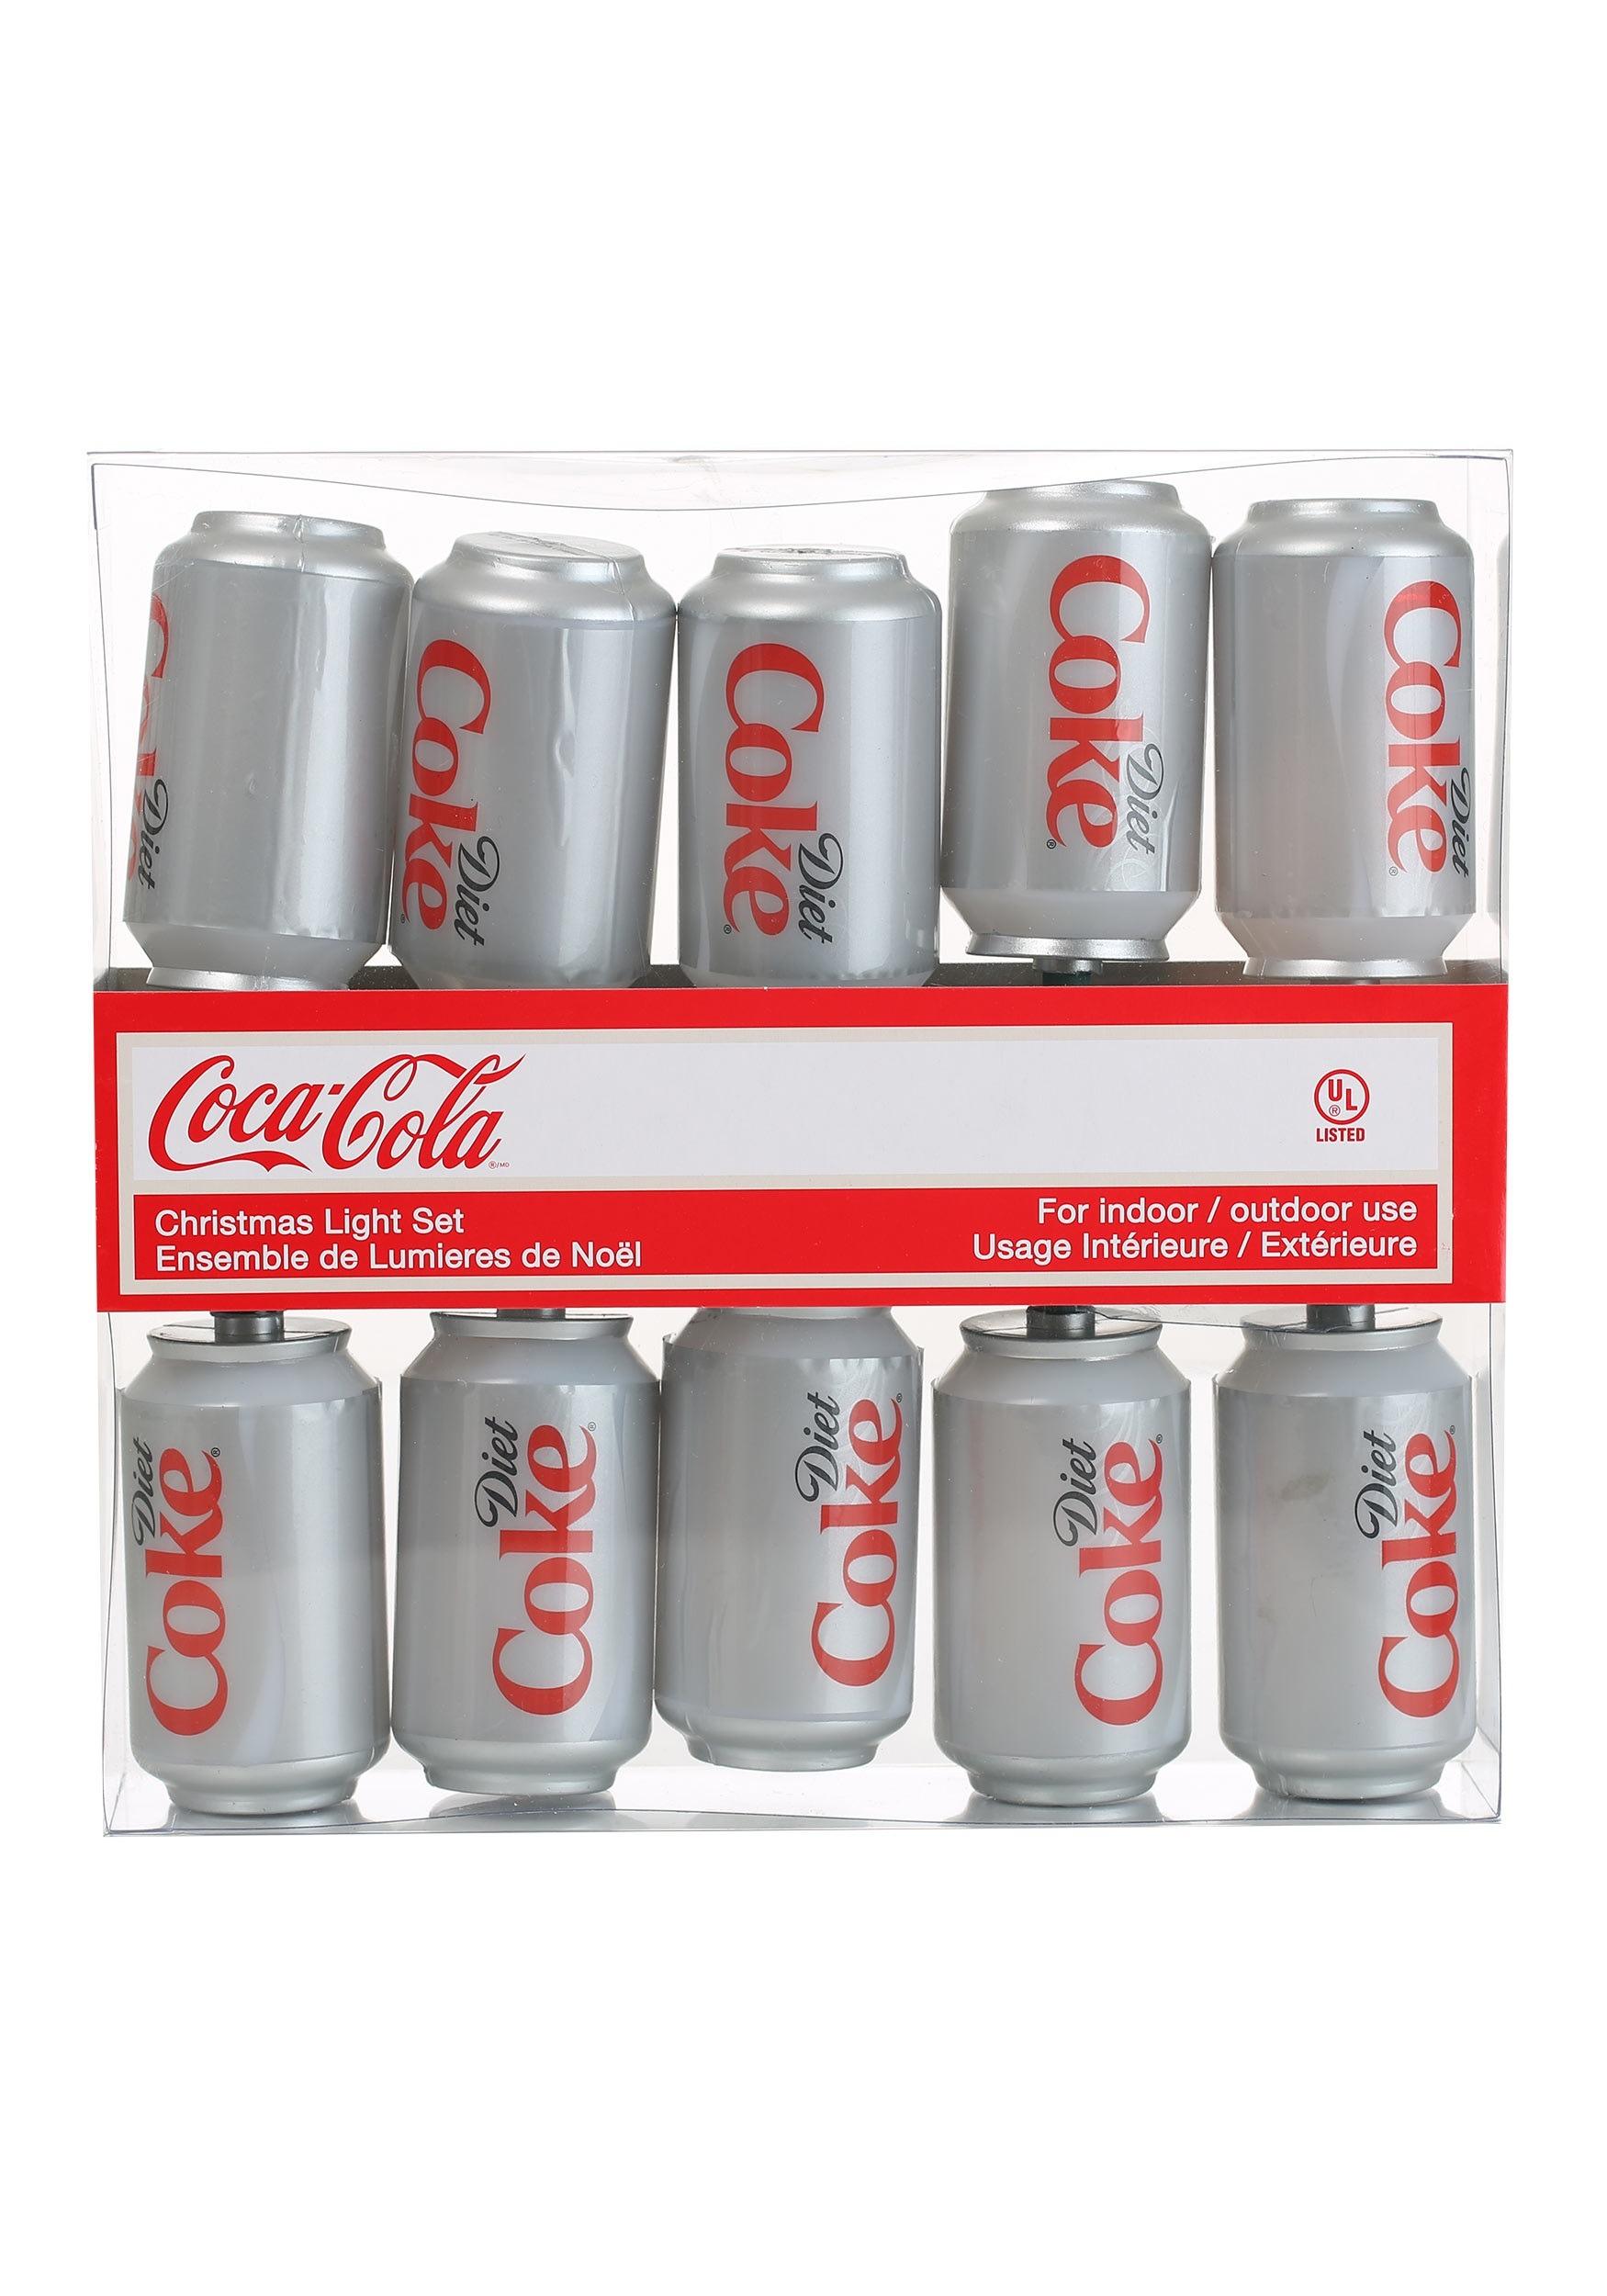 Diet coke can light set diet coke can light set aloadofball Images